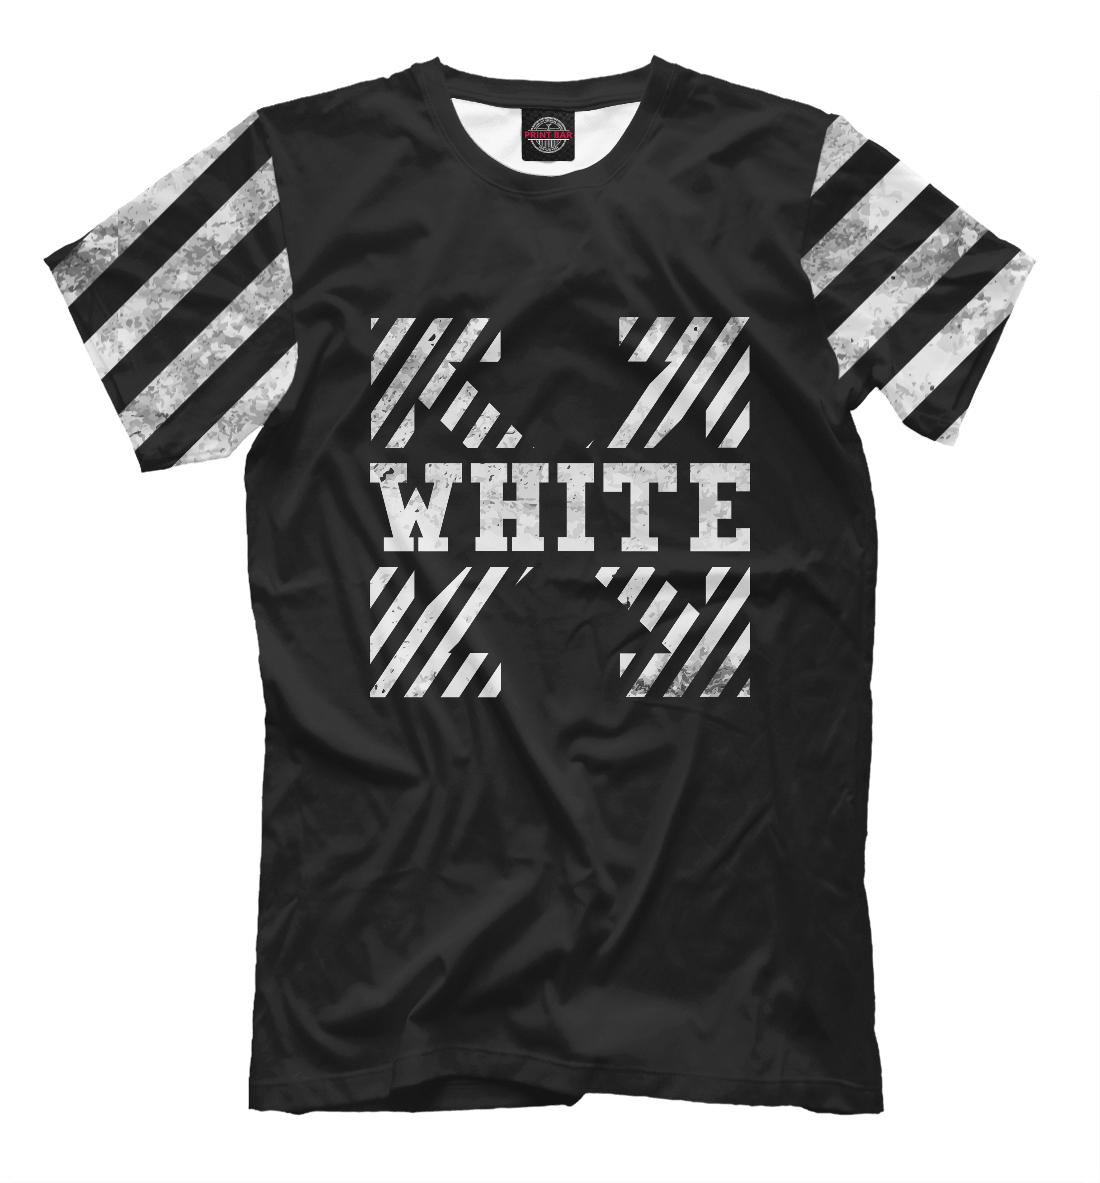 Купить Off-White Grunge Cross, Printbar, Футболки, APD-618976-fut-2